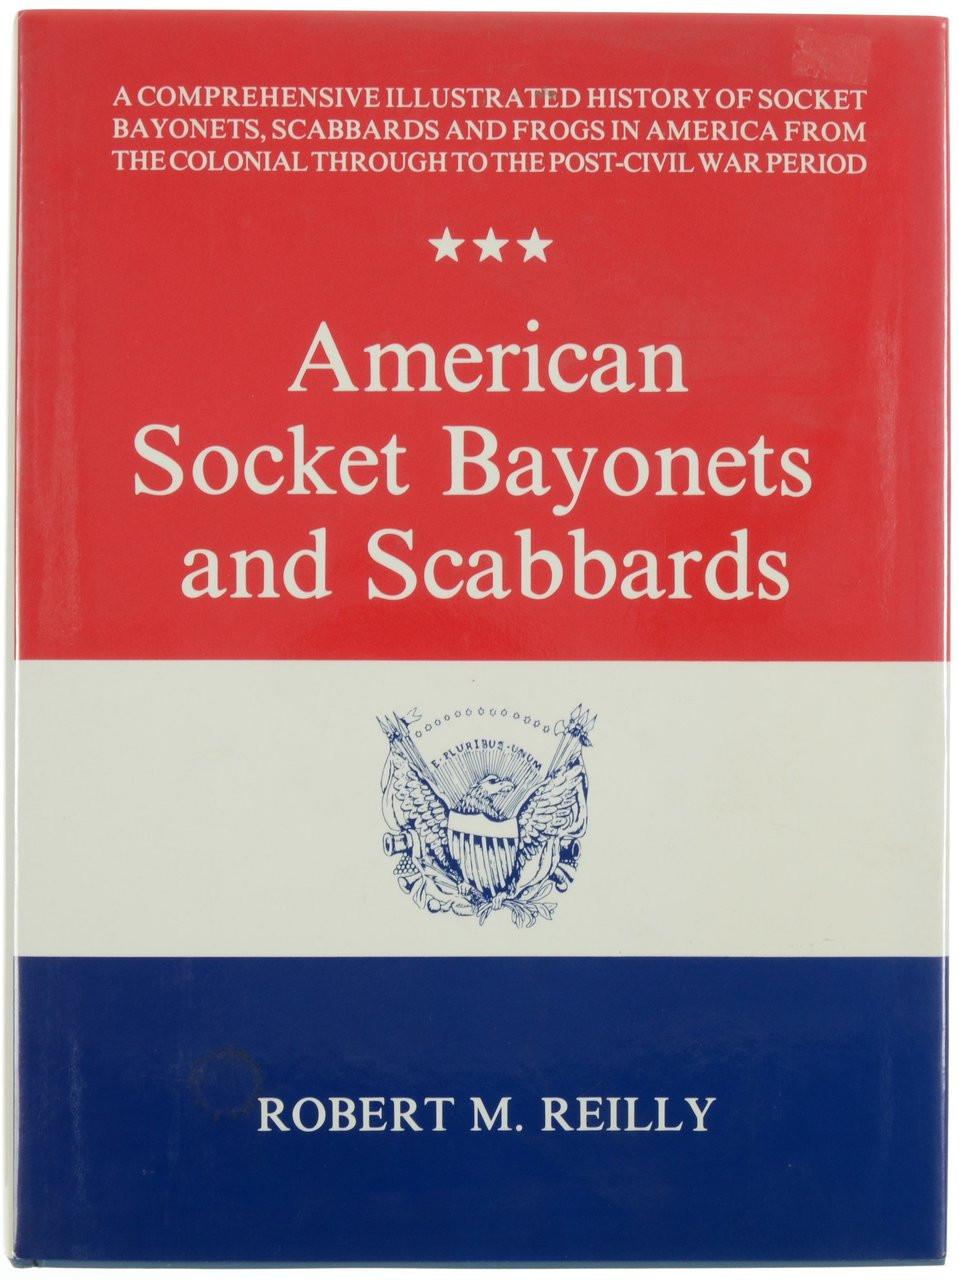 American Socket Bayonets and Scabbards